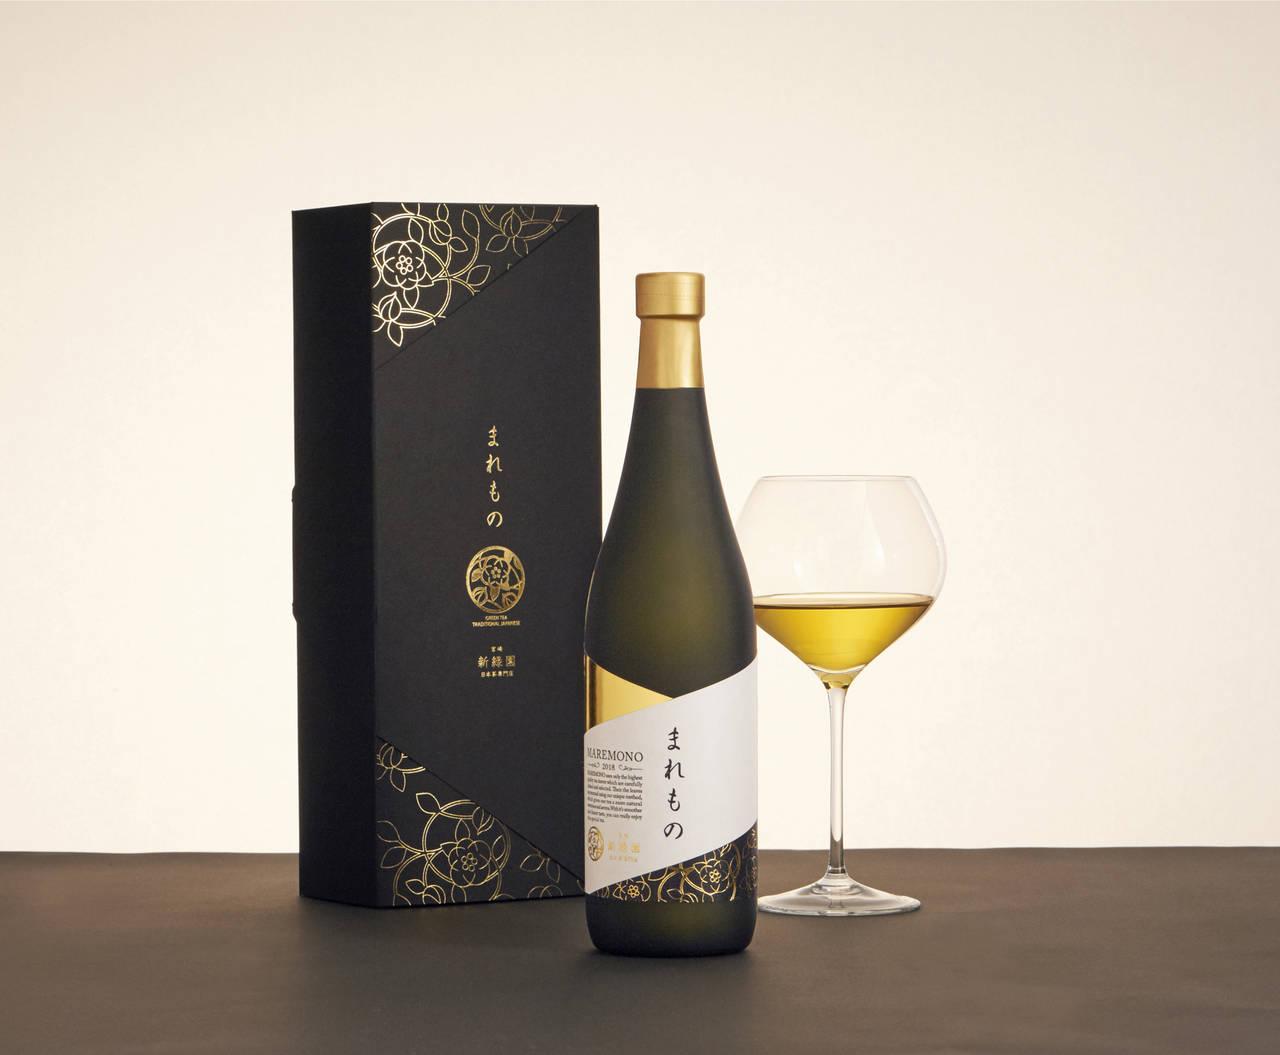 「Great Taste Awards三ツ星受賞」「日本茶AWARDプラチナ賞受賞」2018年各賞受賞商品「まれもの」茶葉を贅沢使用。高級「BOTTLING TEA・まれもの」販売。